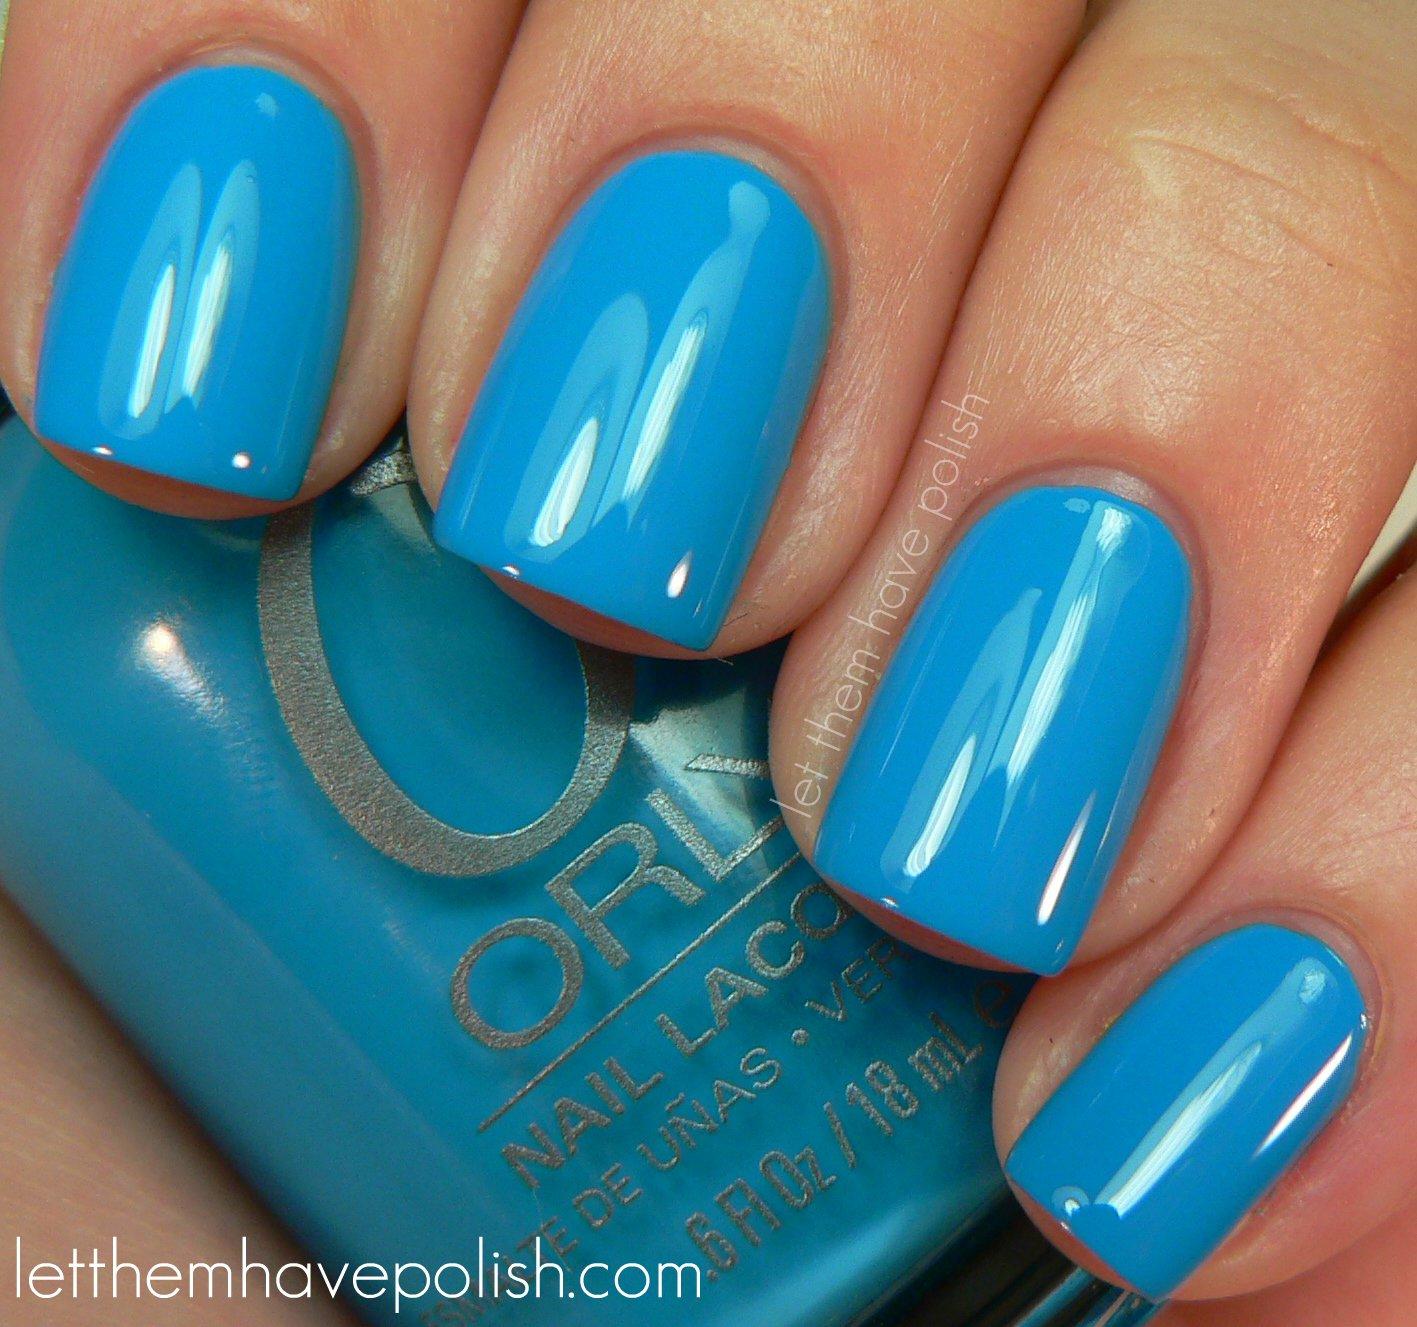 ... Have Polish!: 31 Day Challenge! Day 5 Blue Nails - 1417x1327 - jpeg